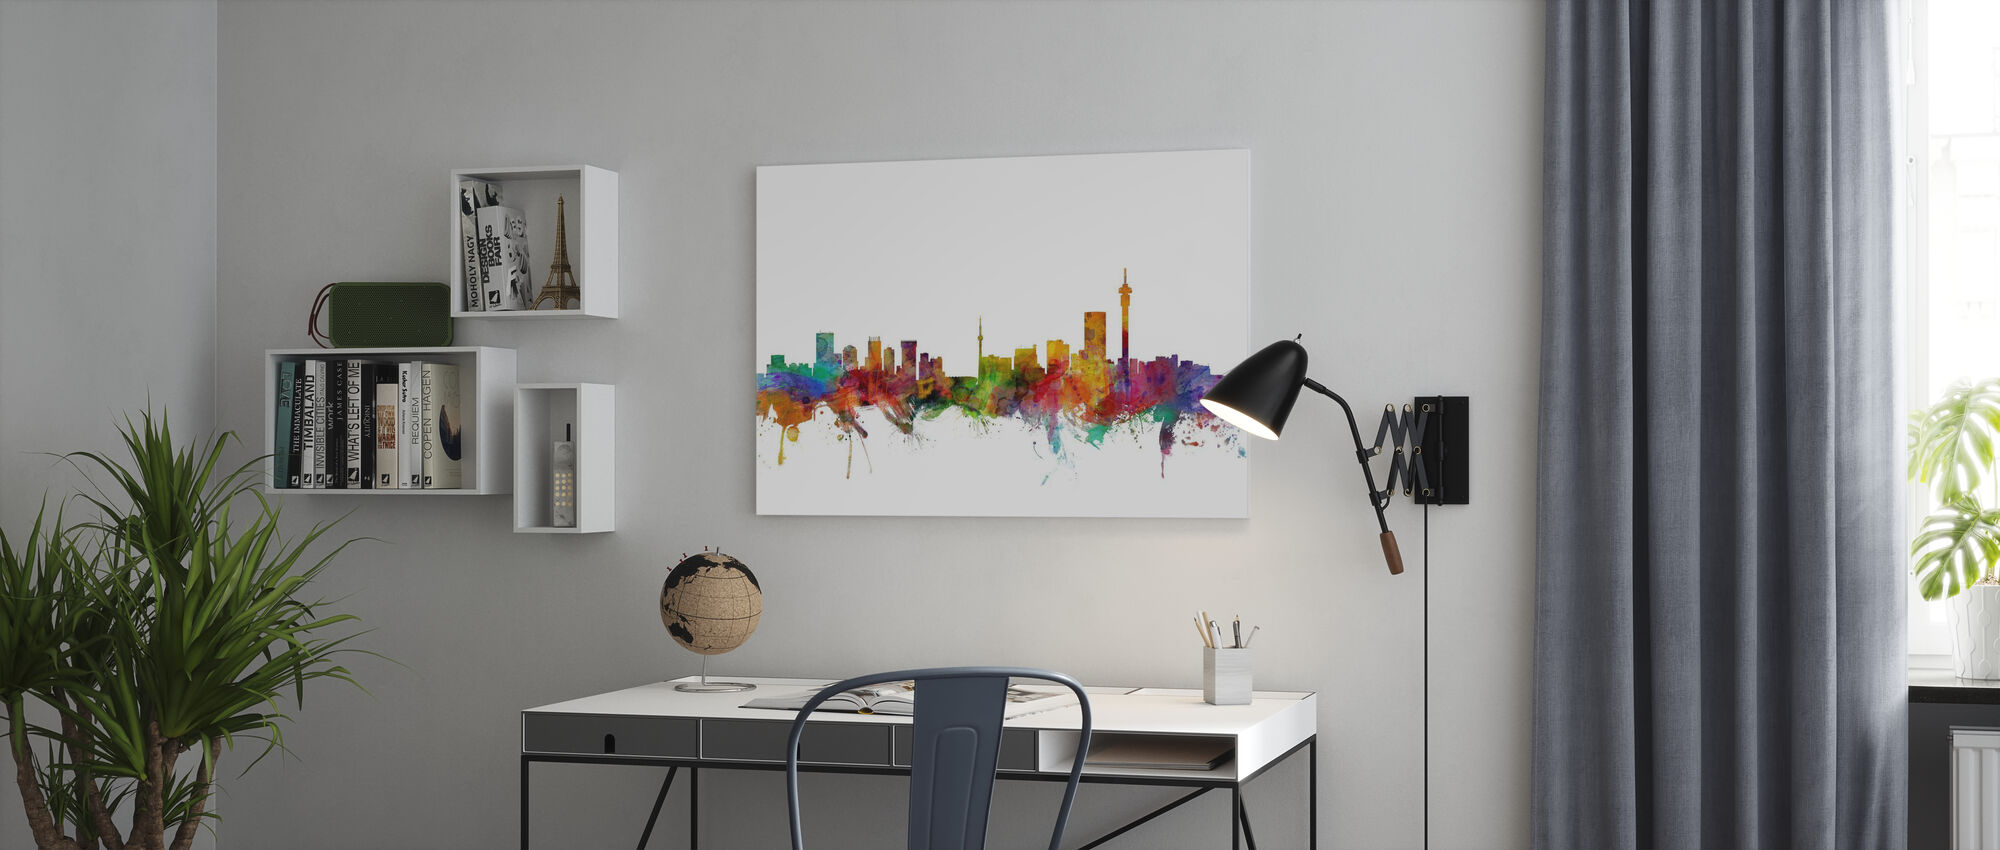 Johannesburg Zuid Afrika Skyline - Canvas print - Kantoor